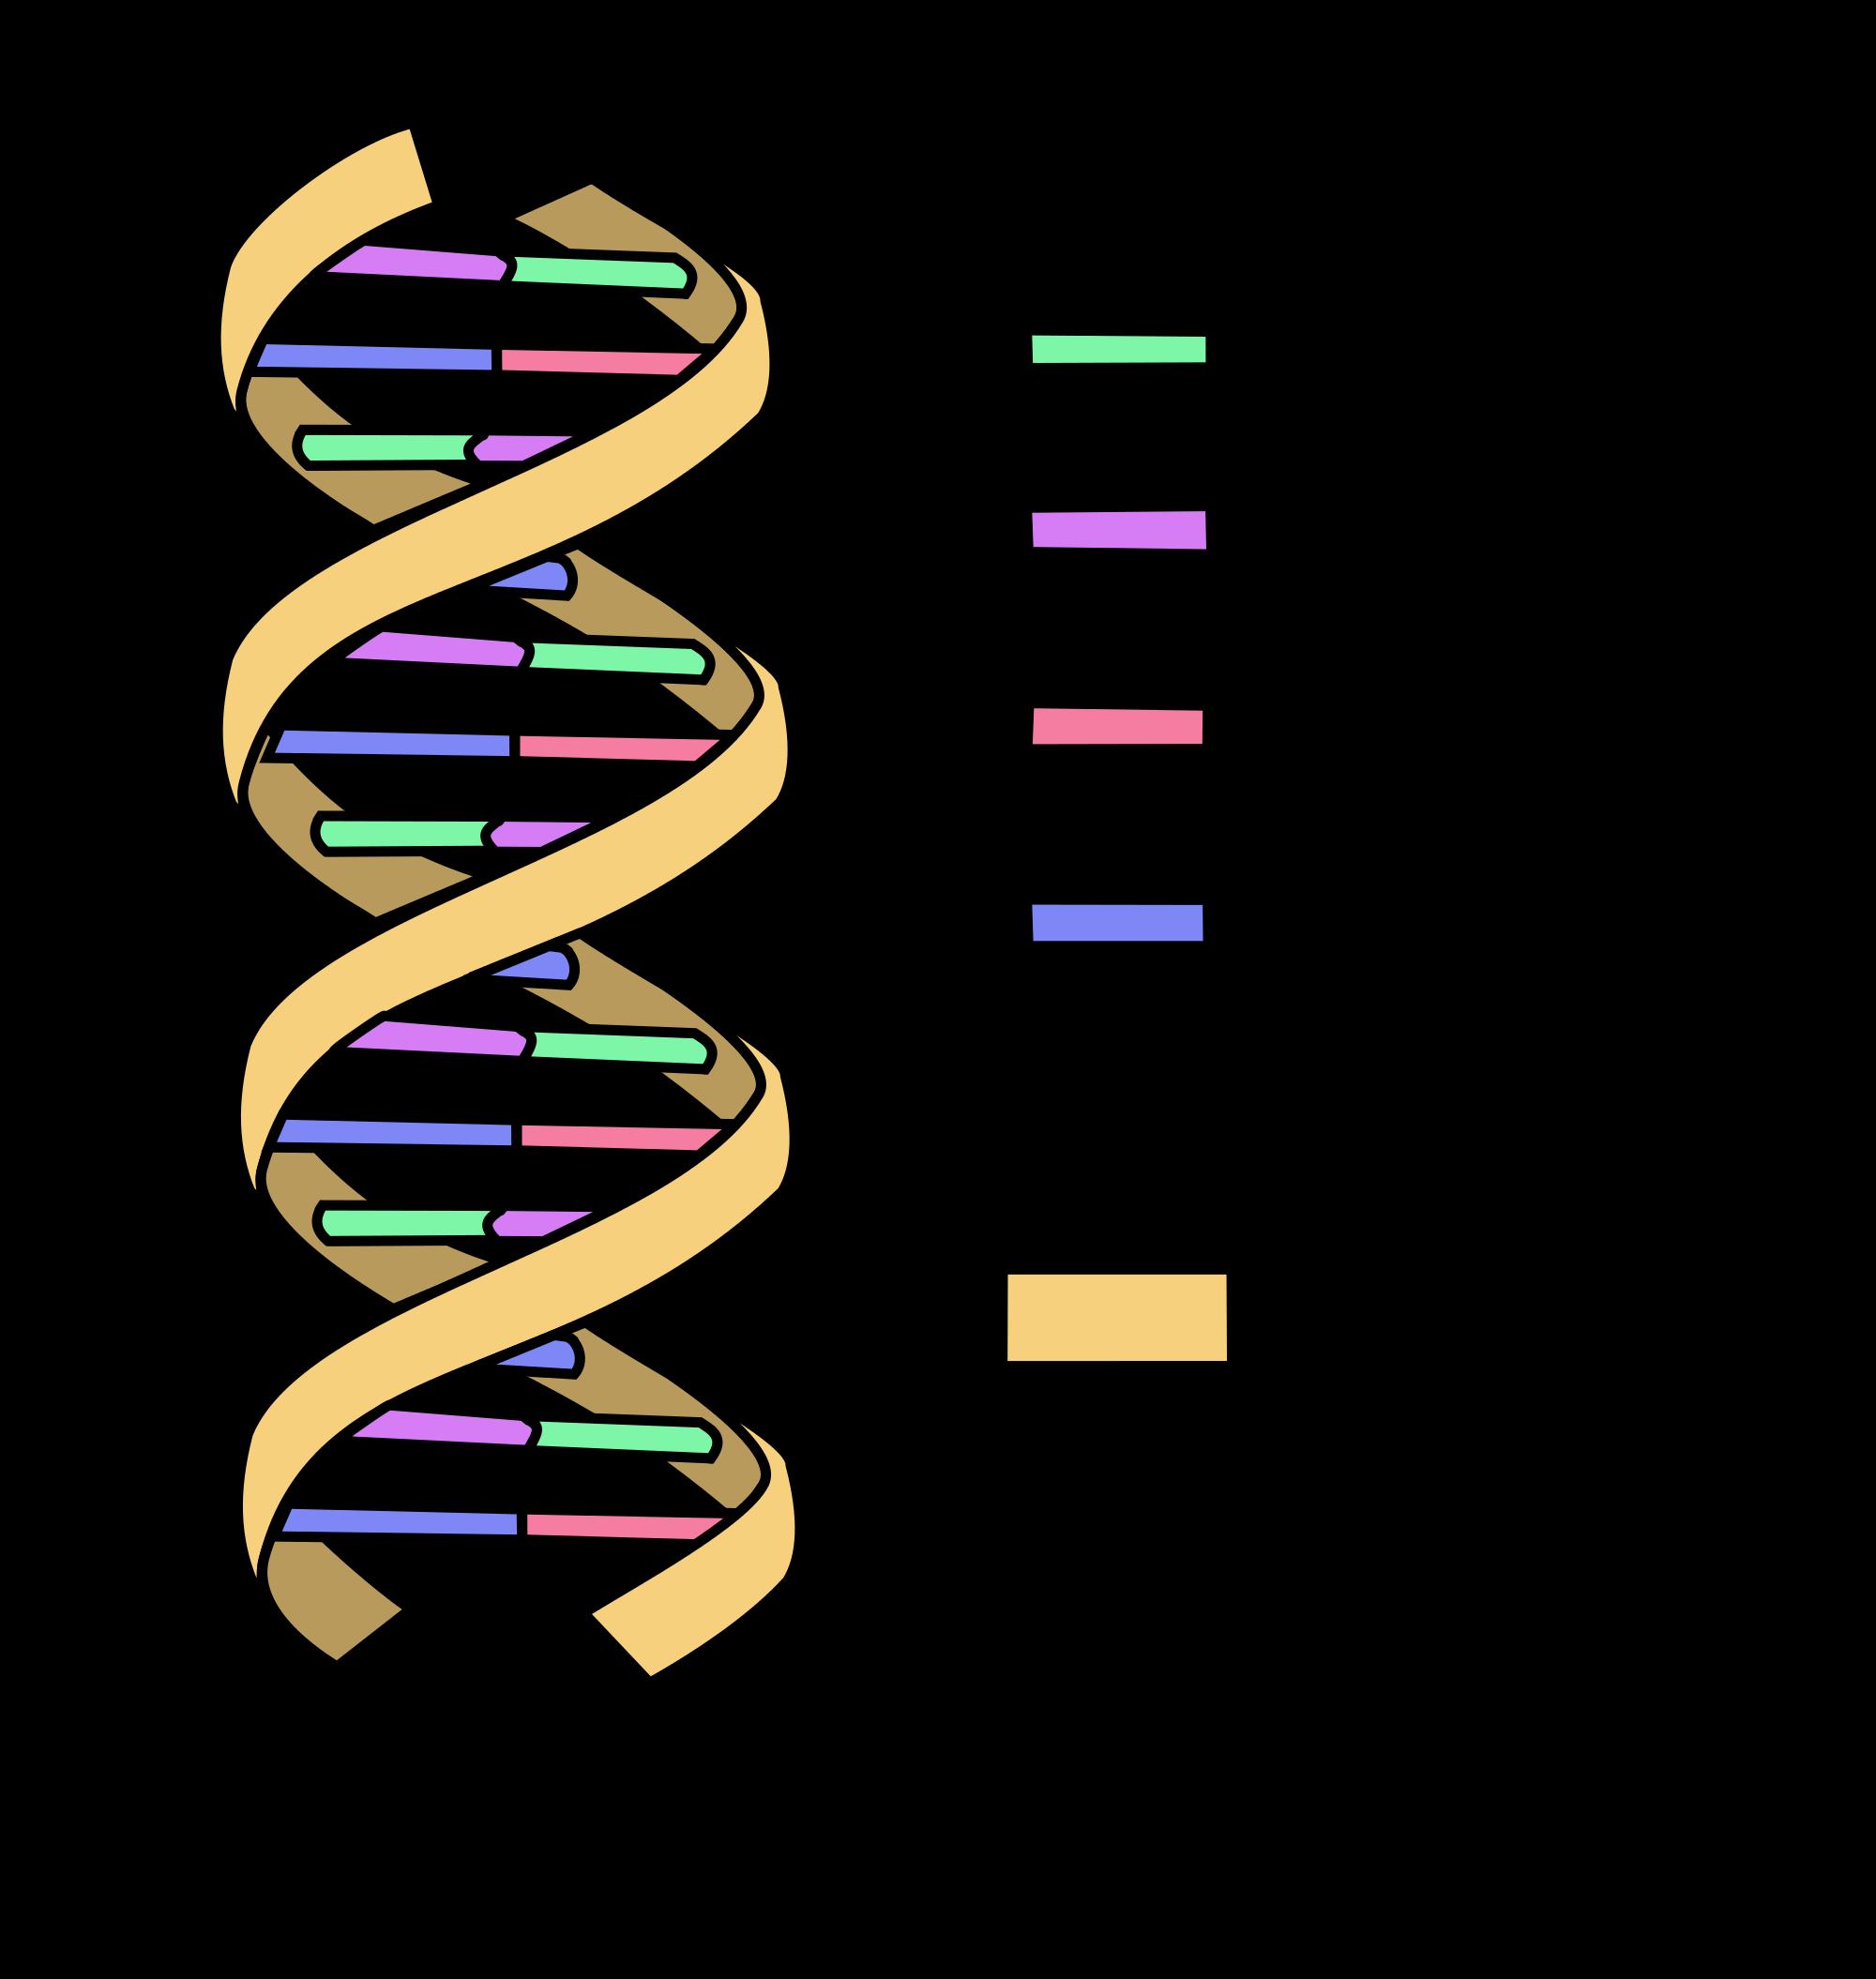 Dna clipart heredity. Oncology basics medivizor the